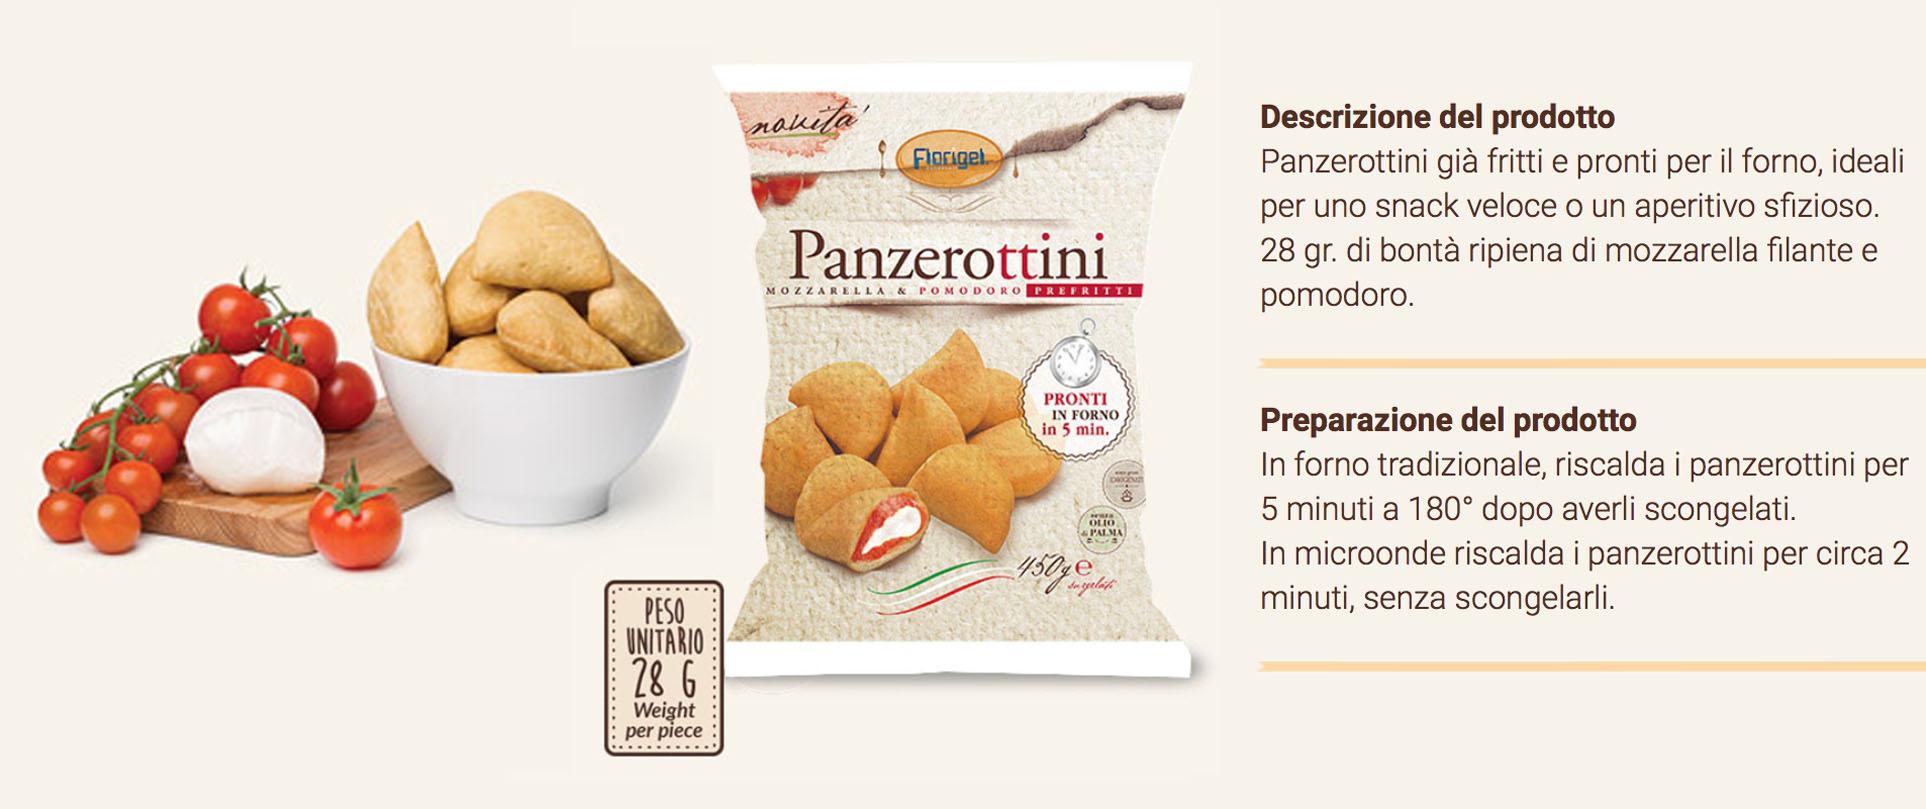 Panzerottini Pomodoro E Mozzarella Florigel